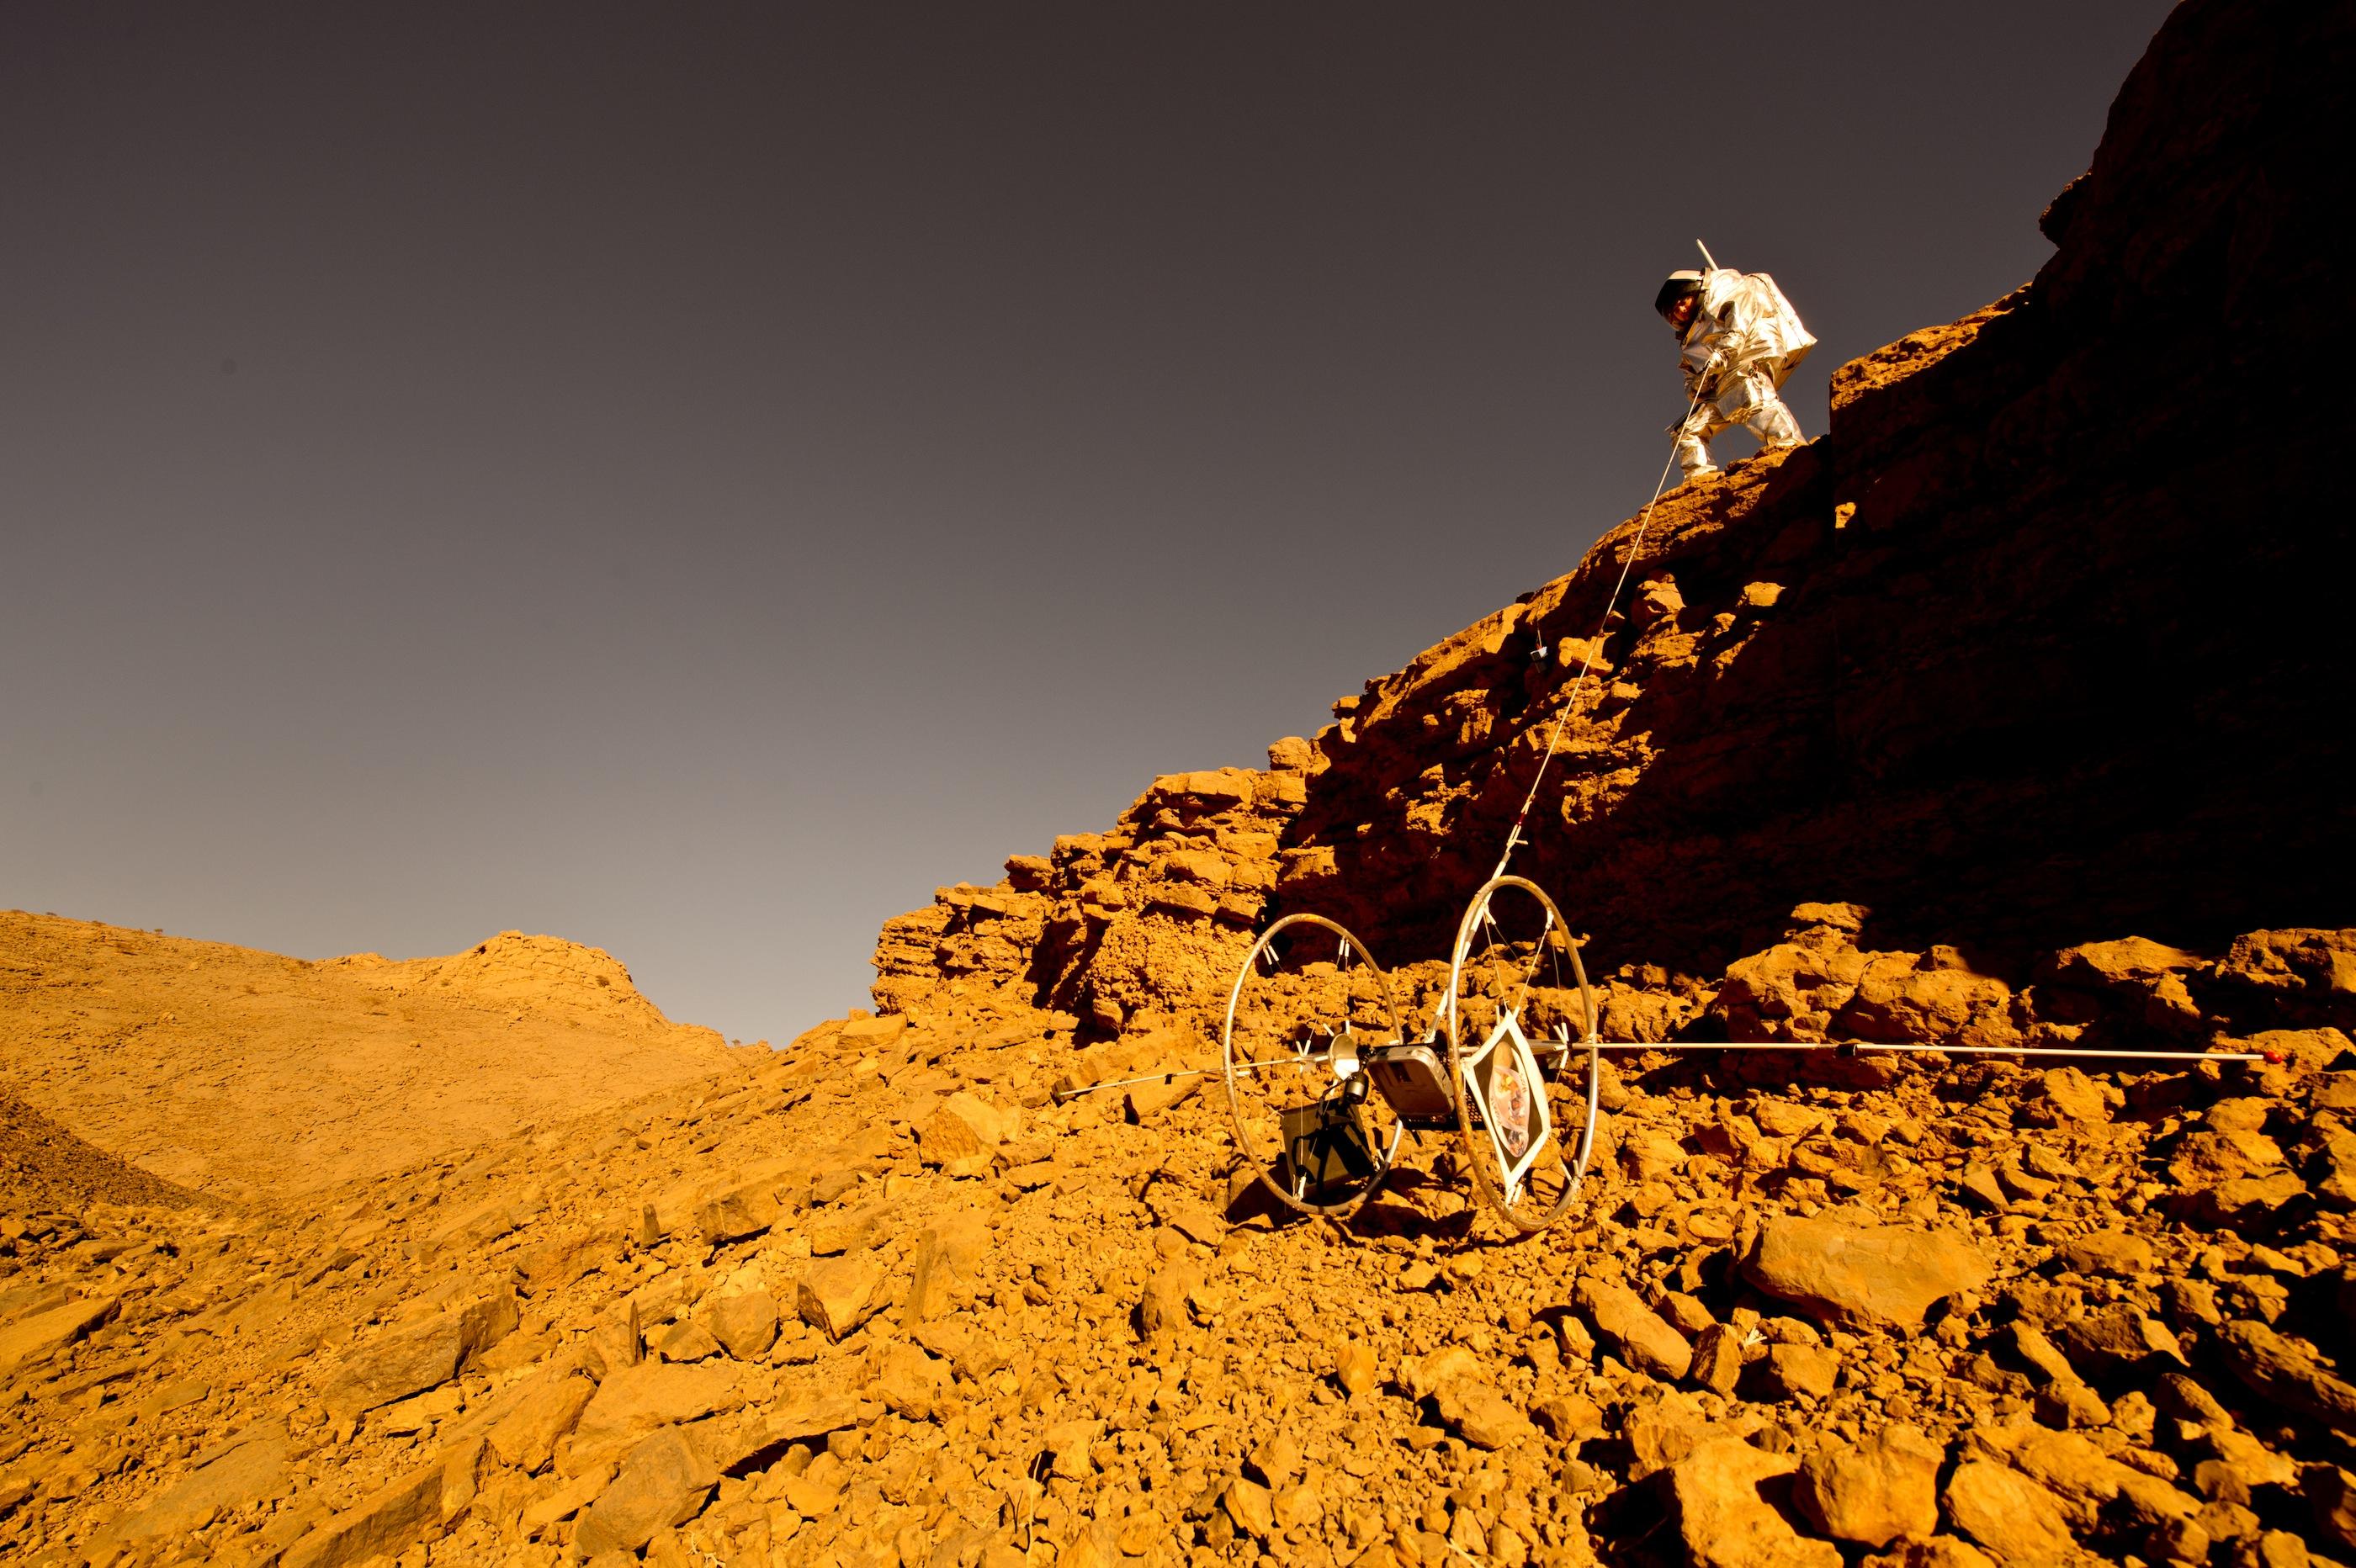 MARS2013 Science Bulletin Issue 02, 22Feb2013